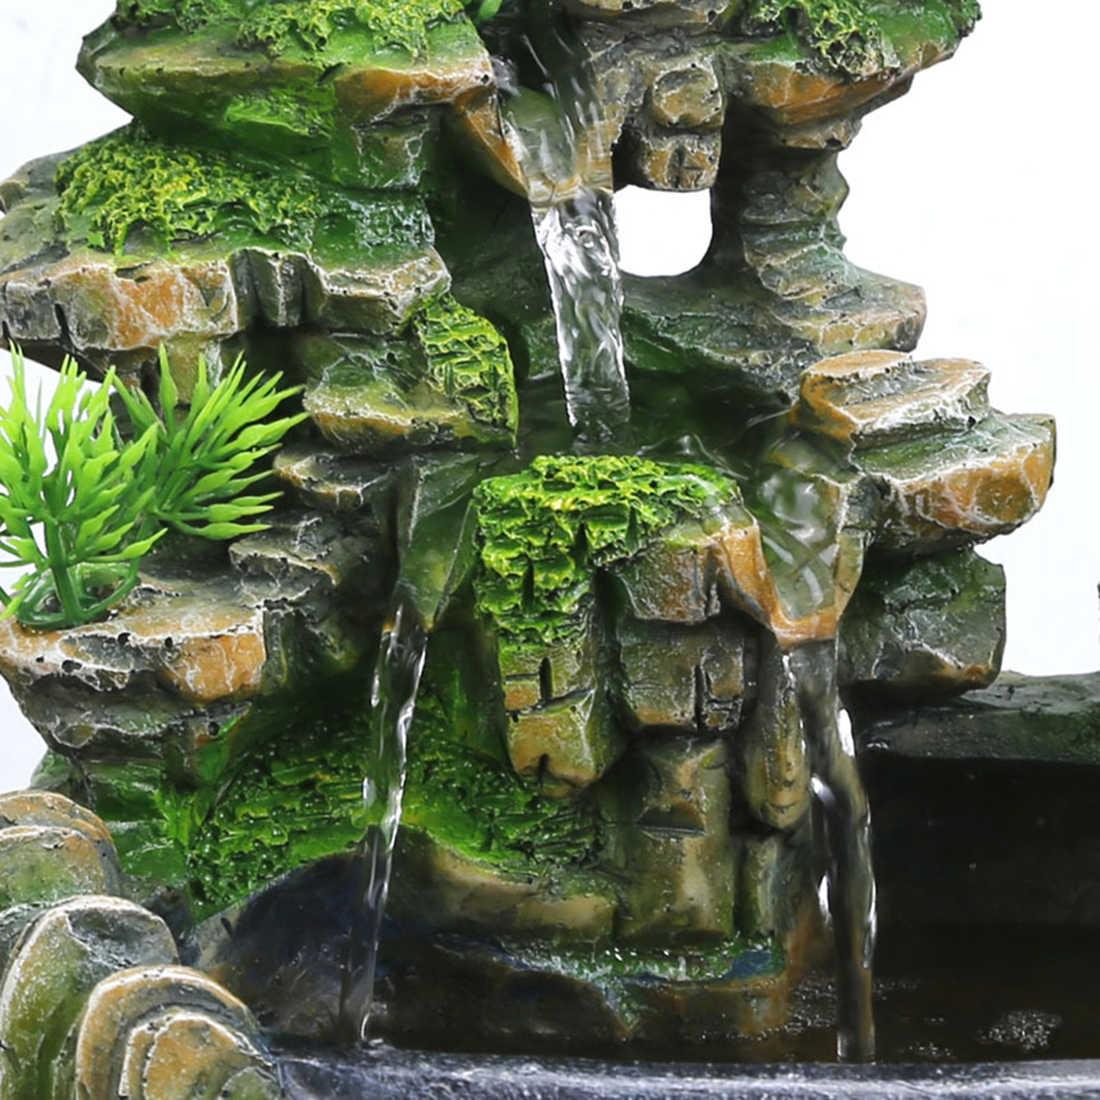 Desktop Humidifier Waterfall Rockery Fountain Flowing Water Mini Fish Pond With Fog For Home Decor Drop Shipping Us Eu Plug Fountains Bird Baths Aliexpress